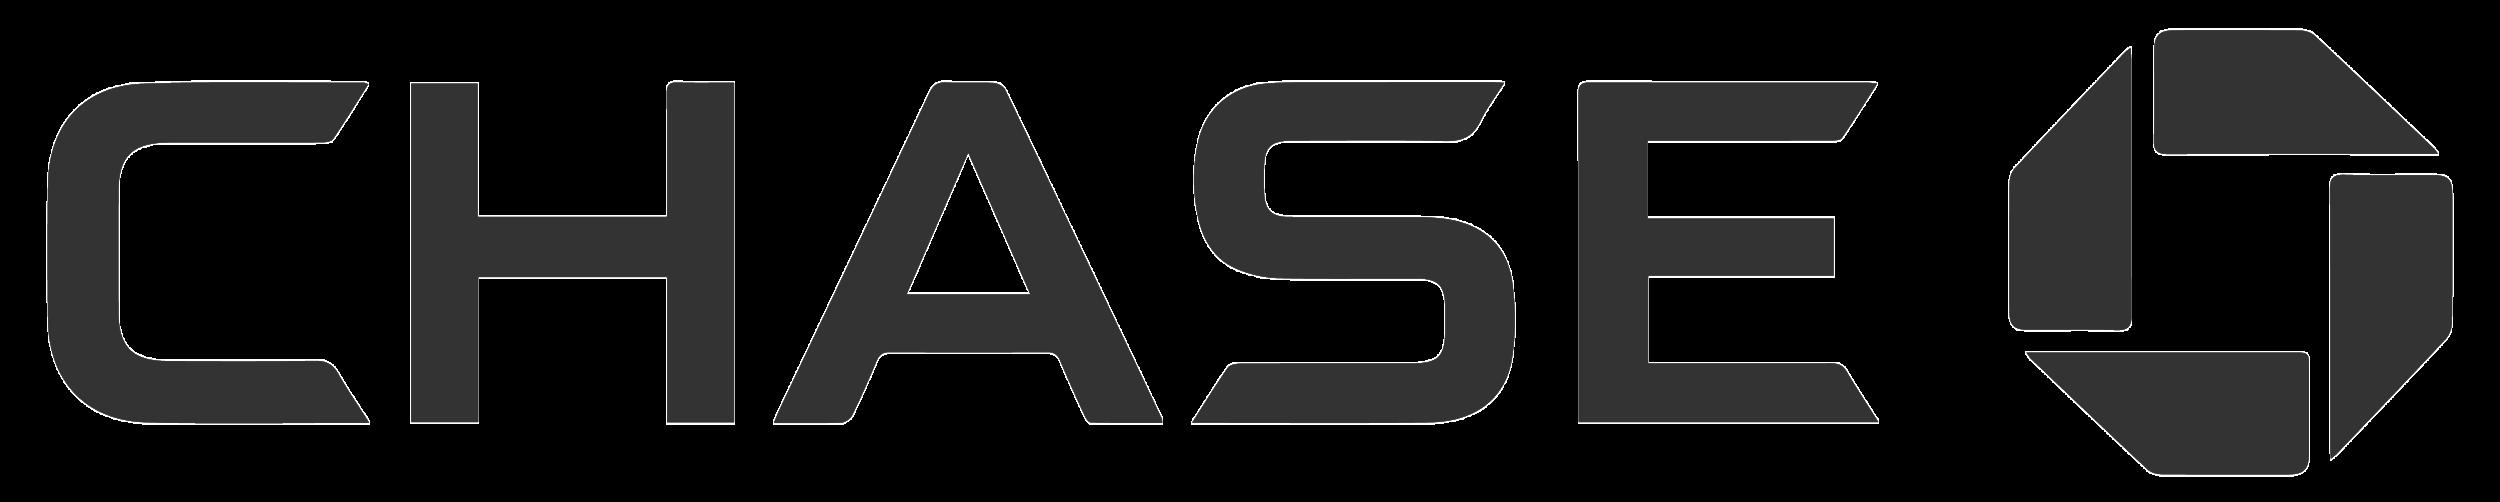 chase_logo-01.png